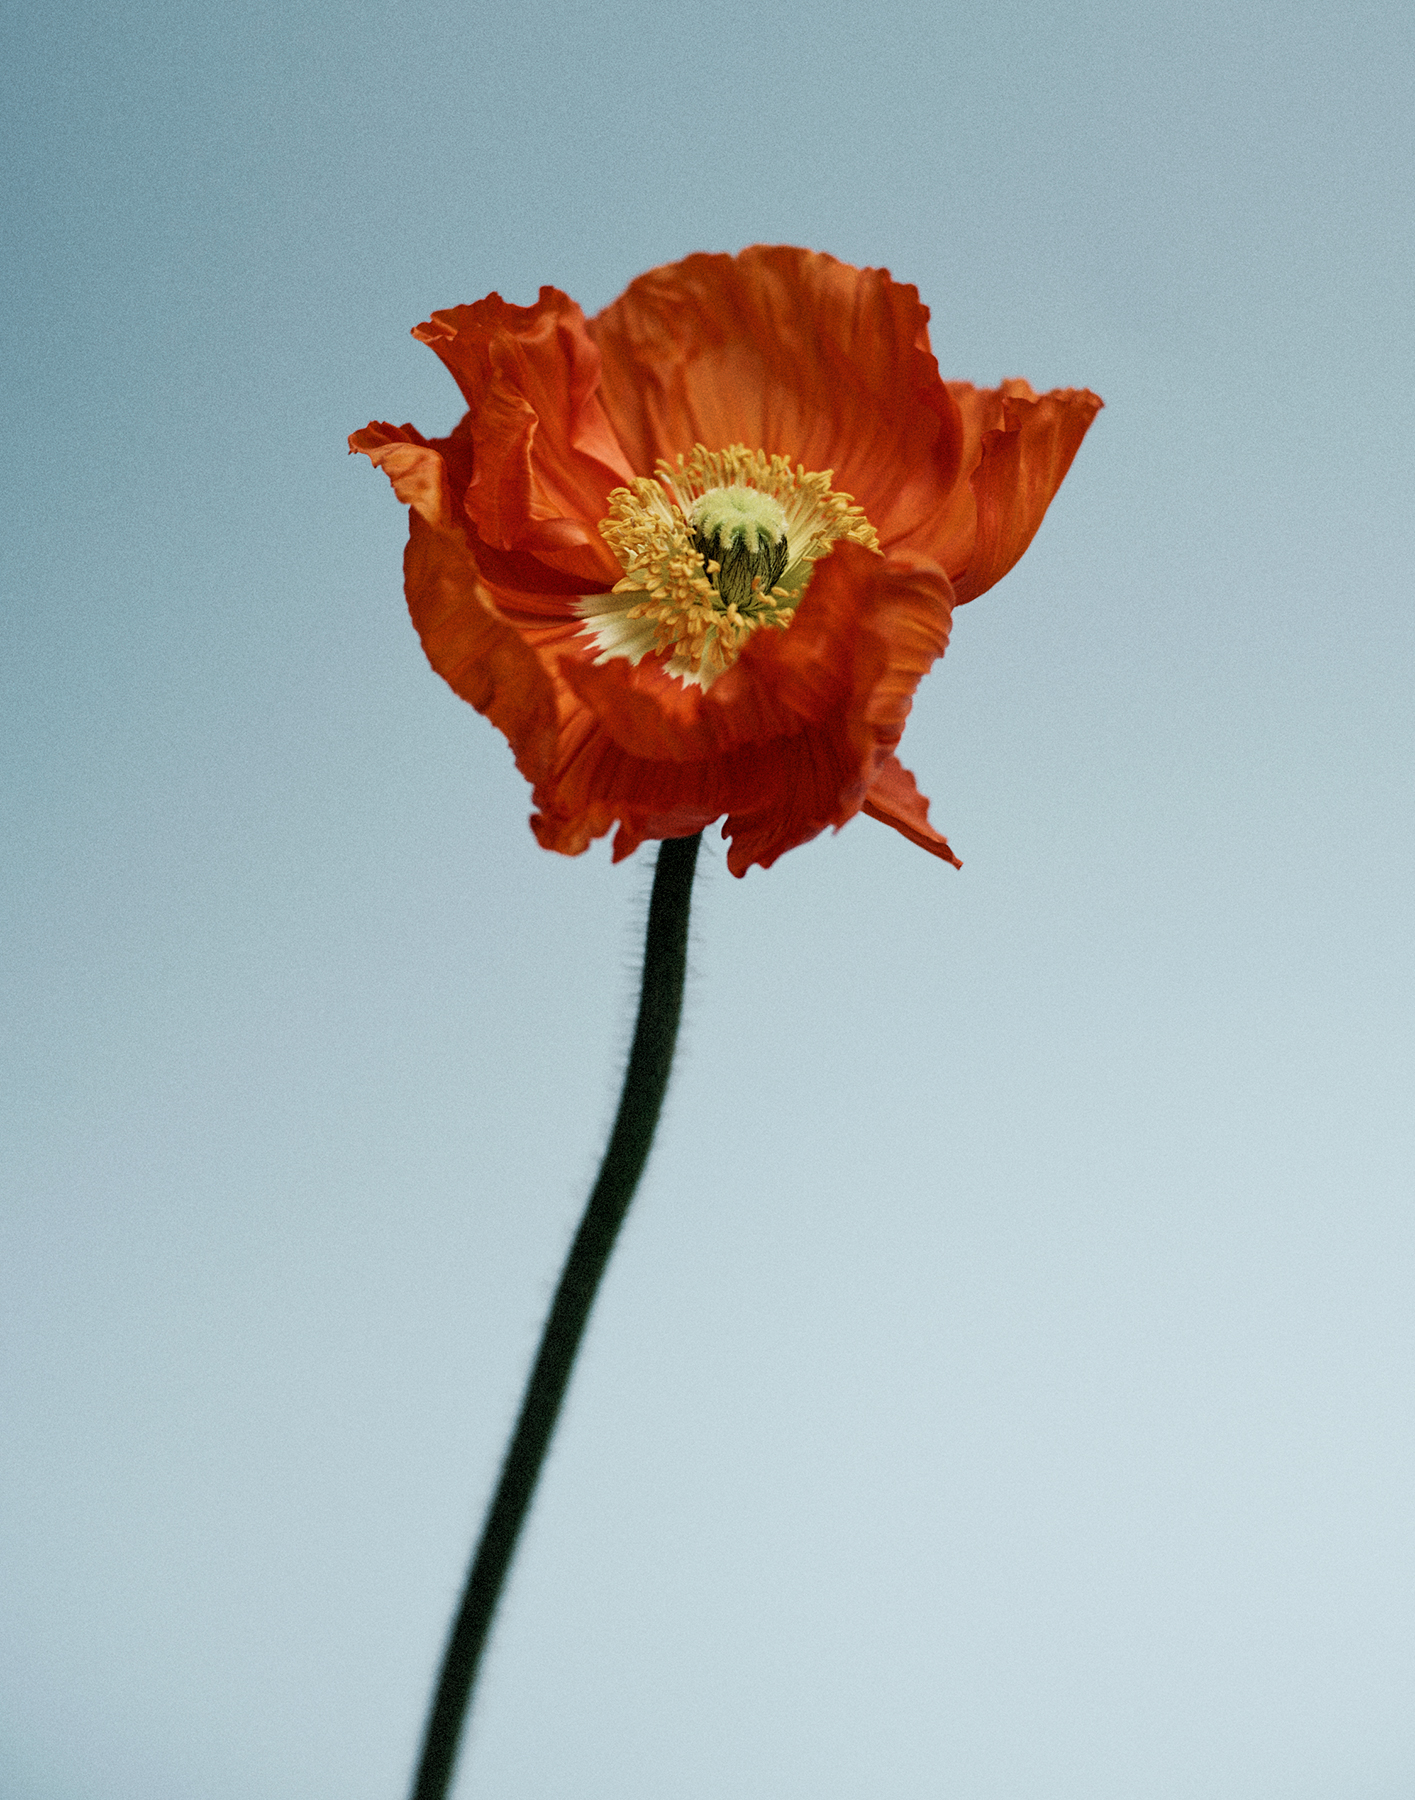 colour photograph of a poppy